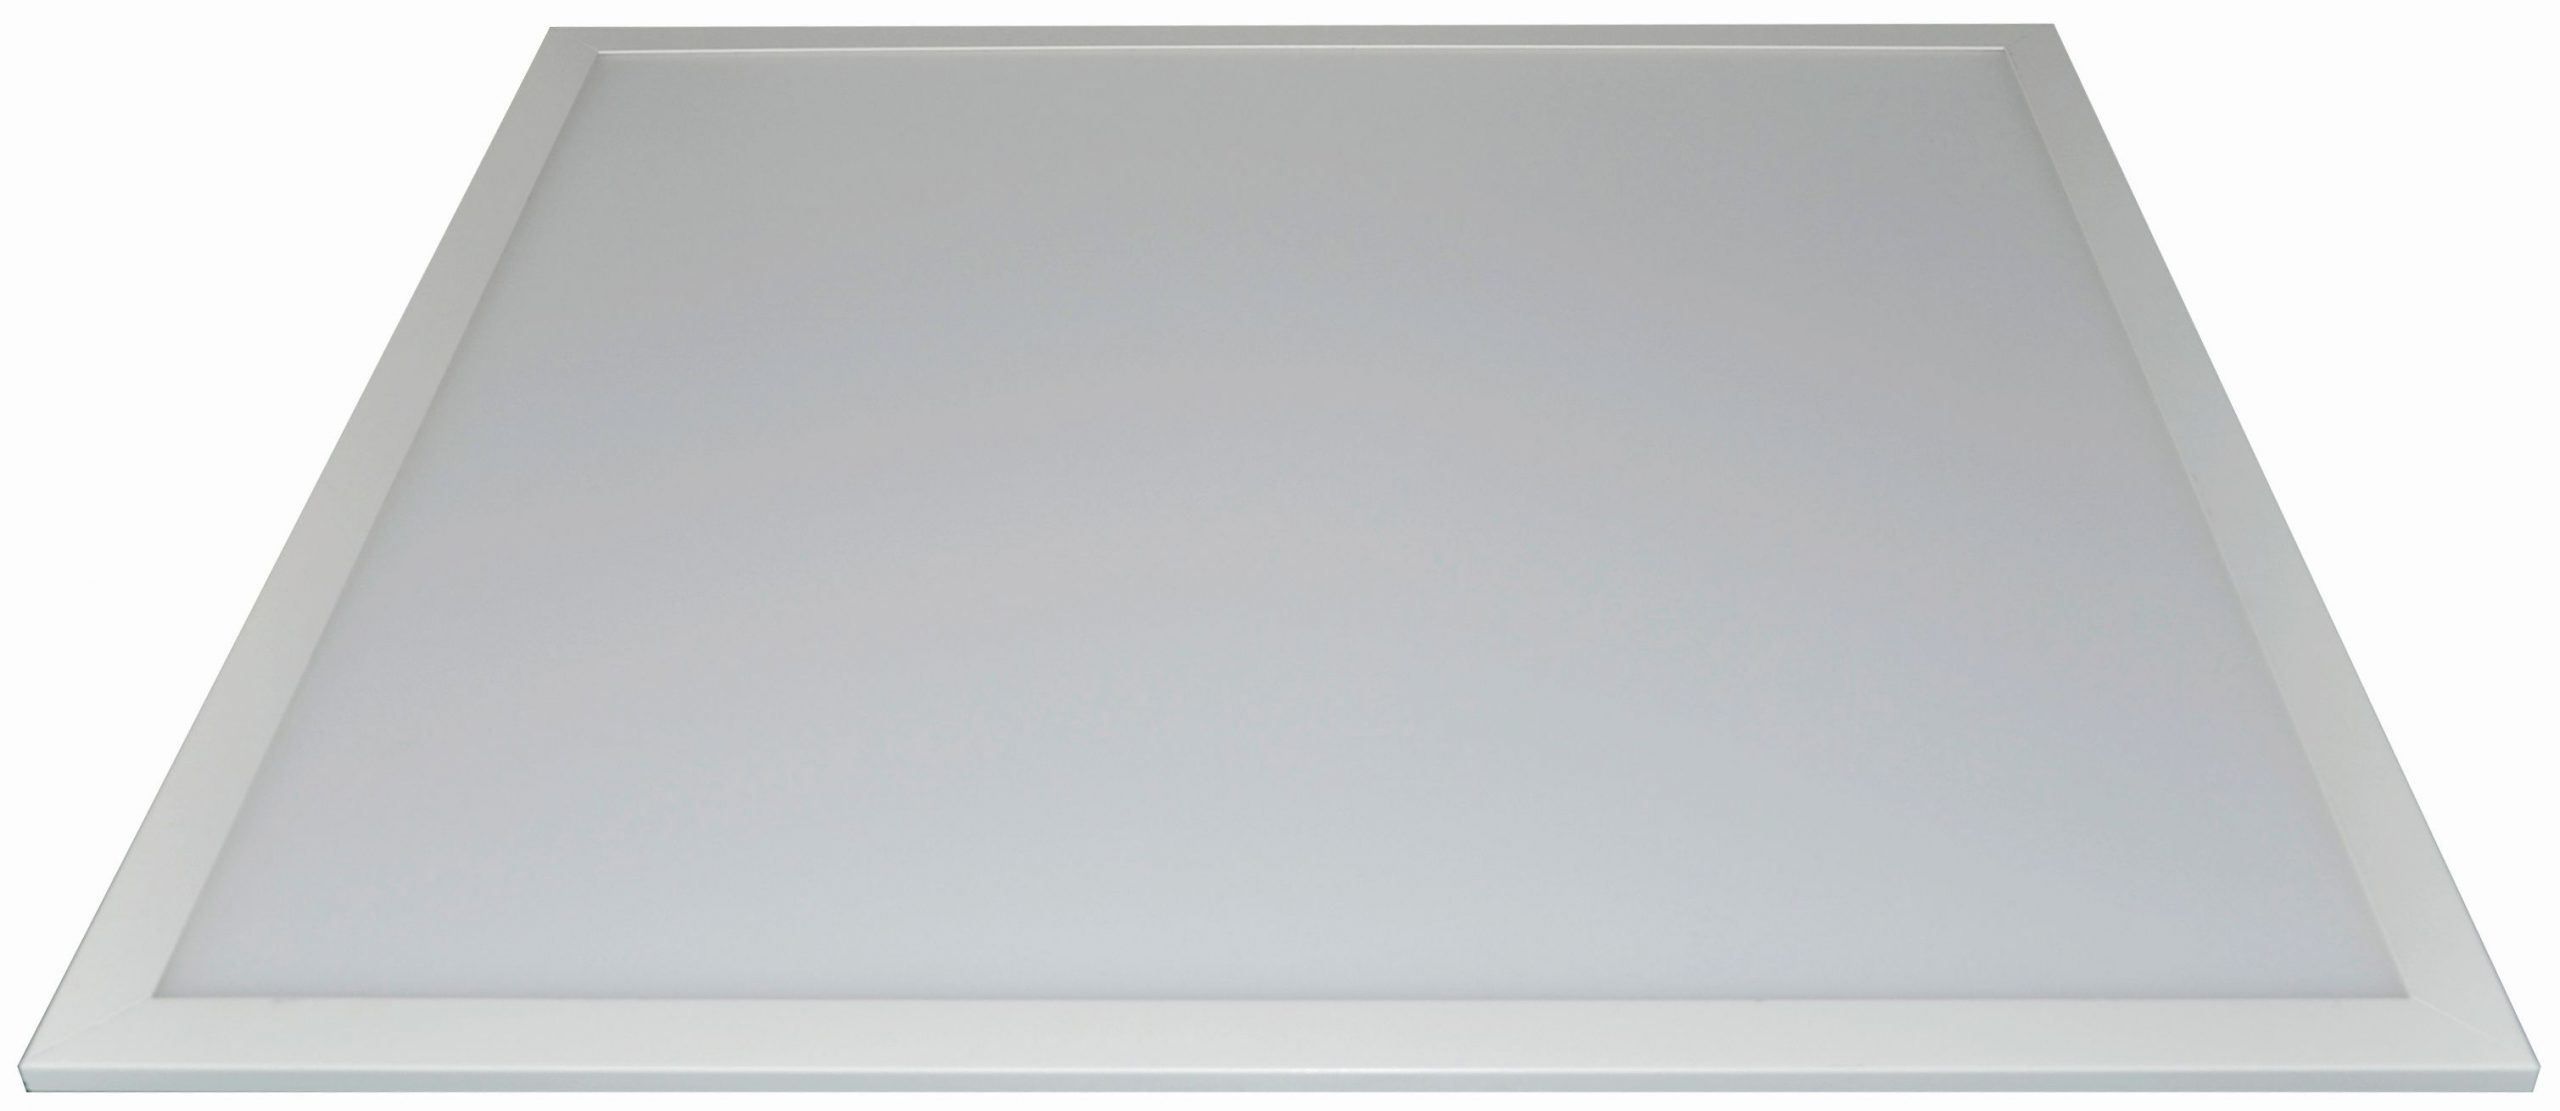 LED Panel Einlegeleuchte Modul-625 Economy– Ausführung: UGR<22